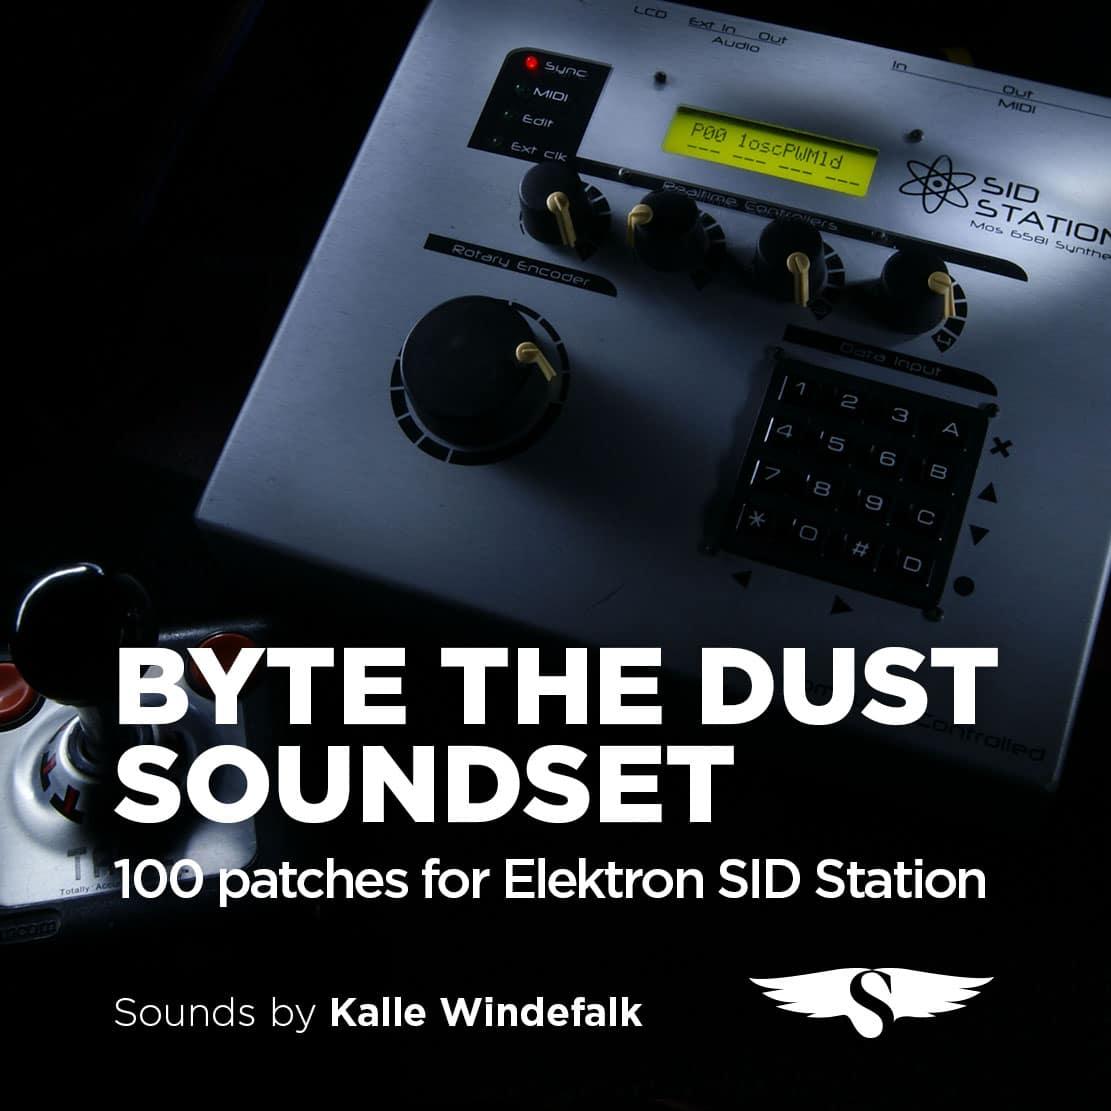 Elektron SID Station Byte The Dust Soundset